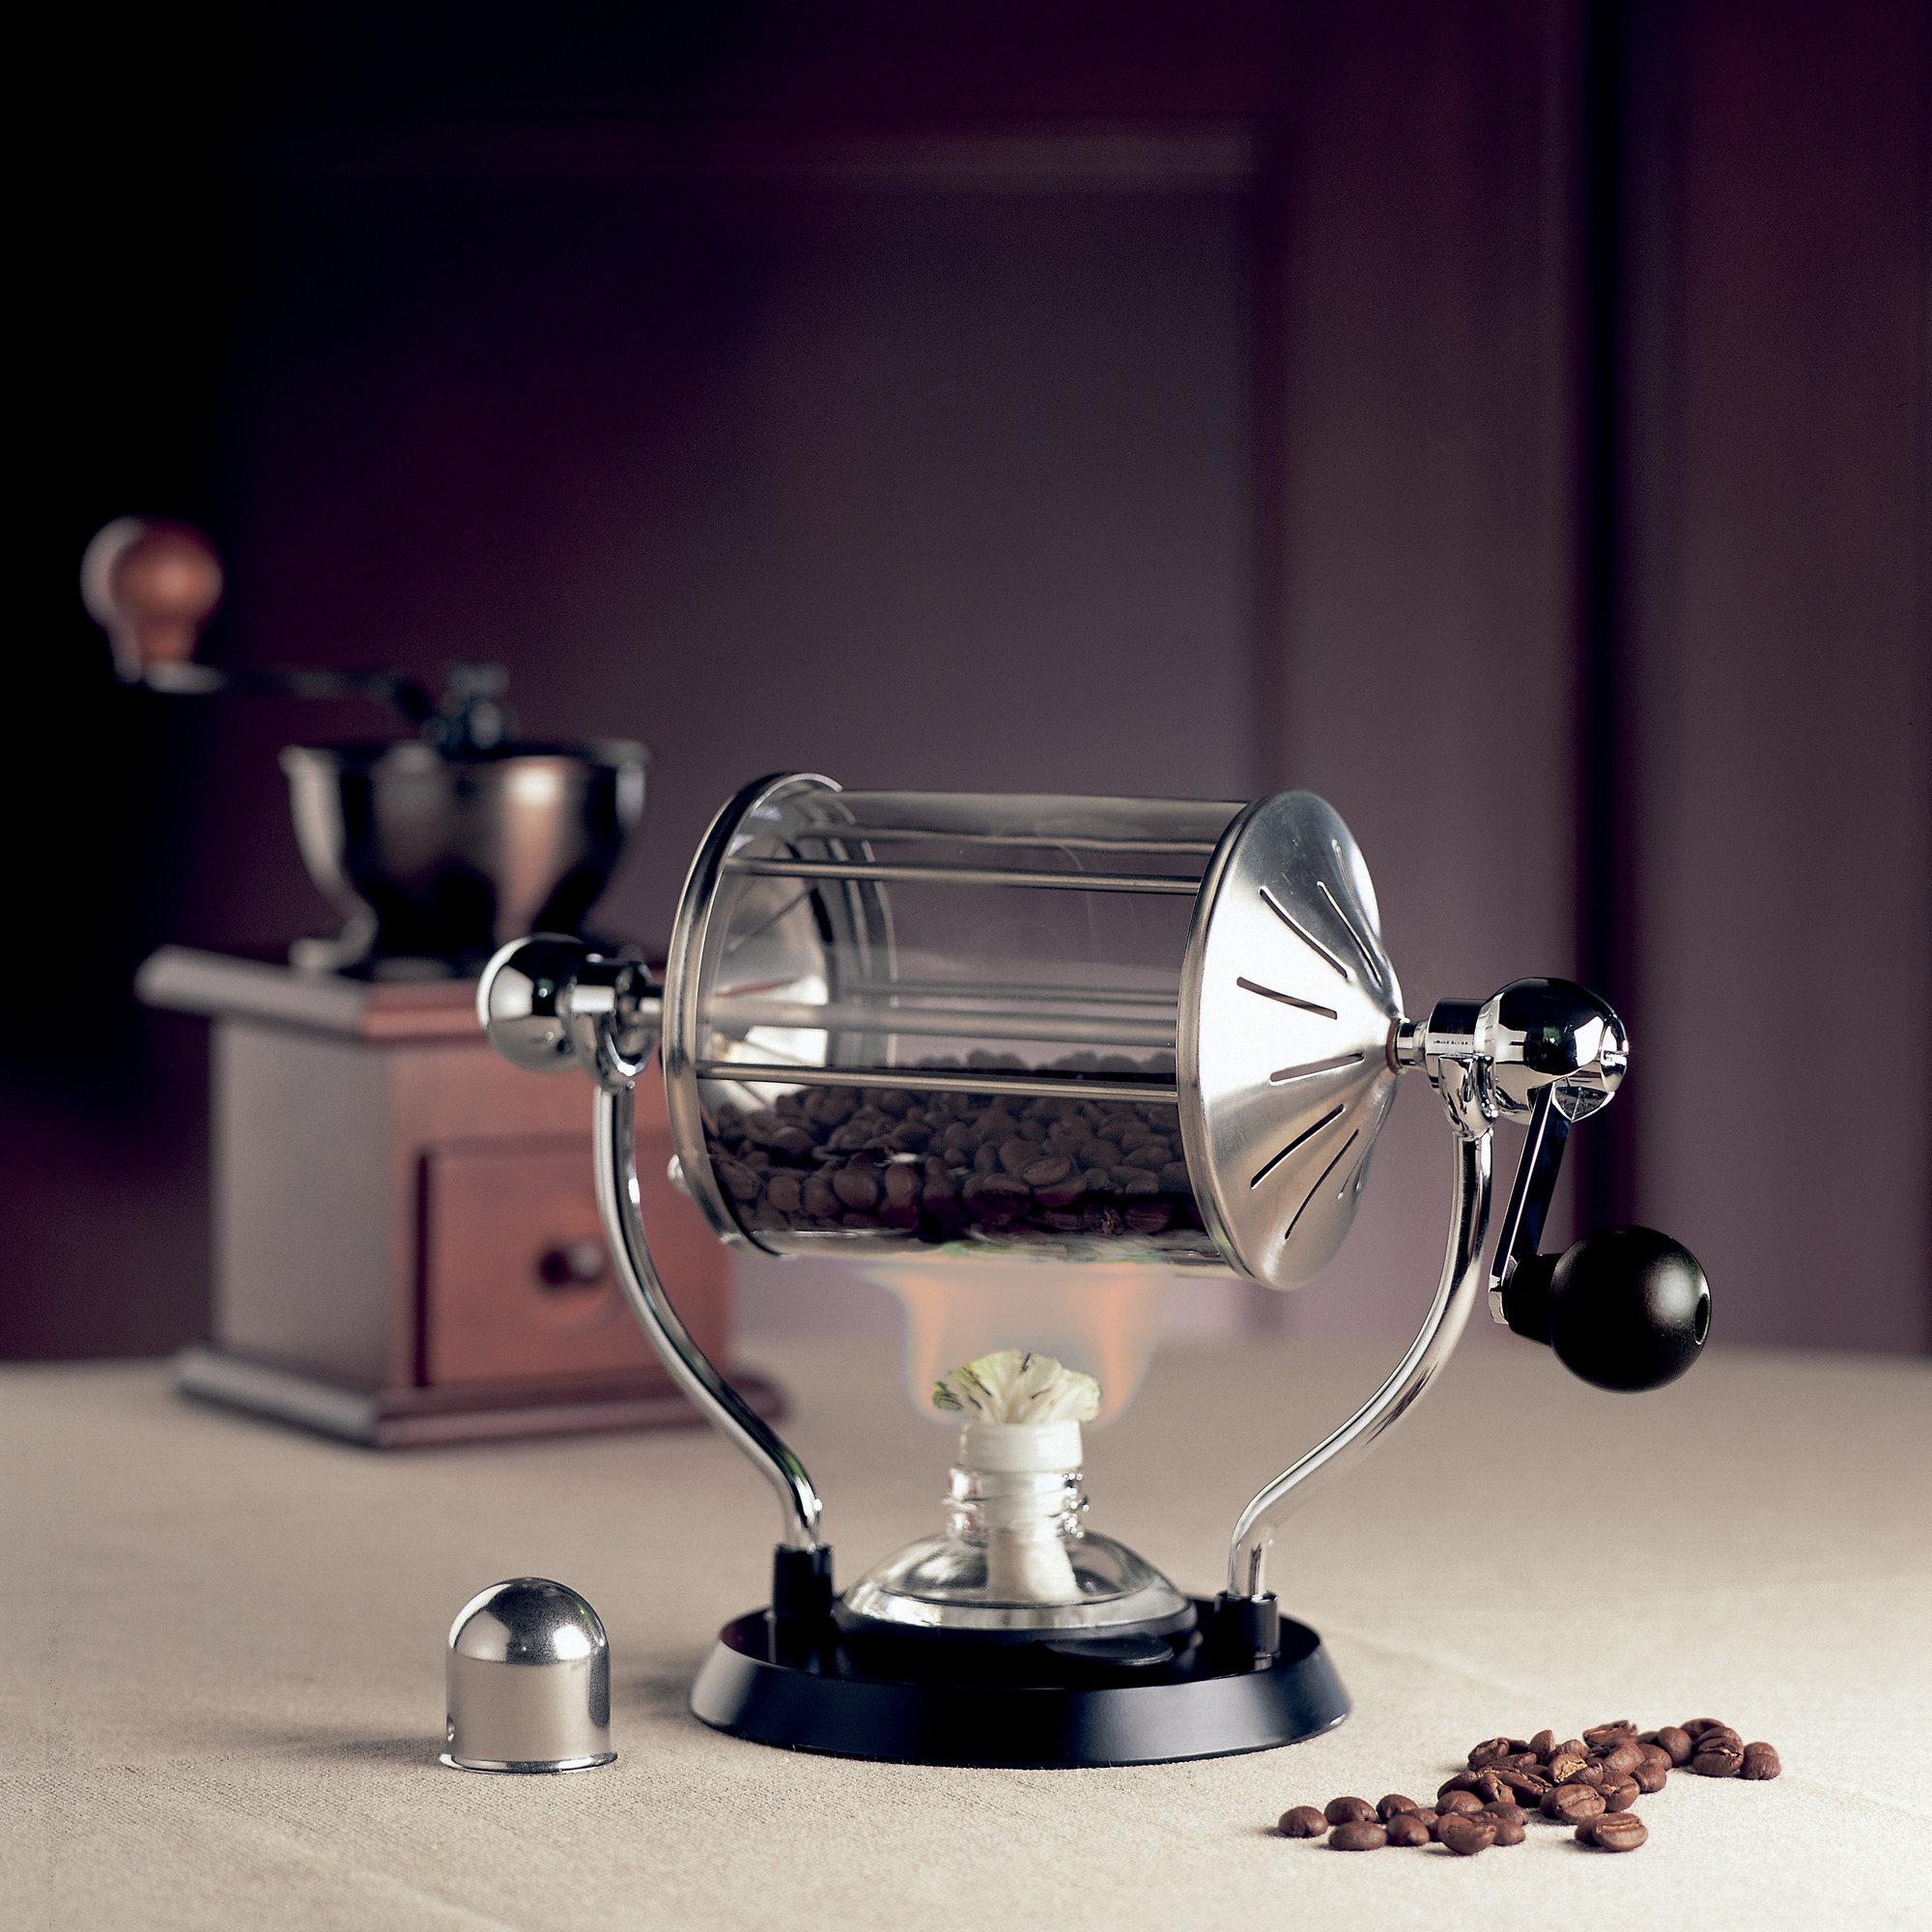 Hario Retro Coffee Roaster